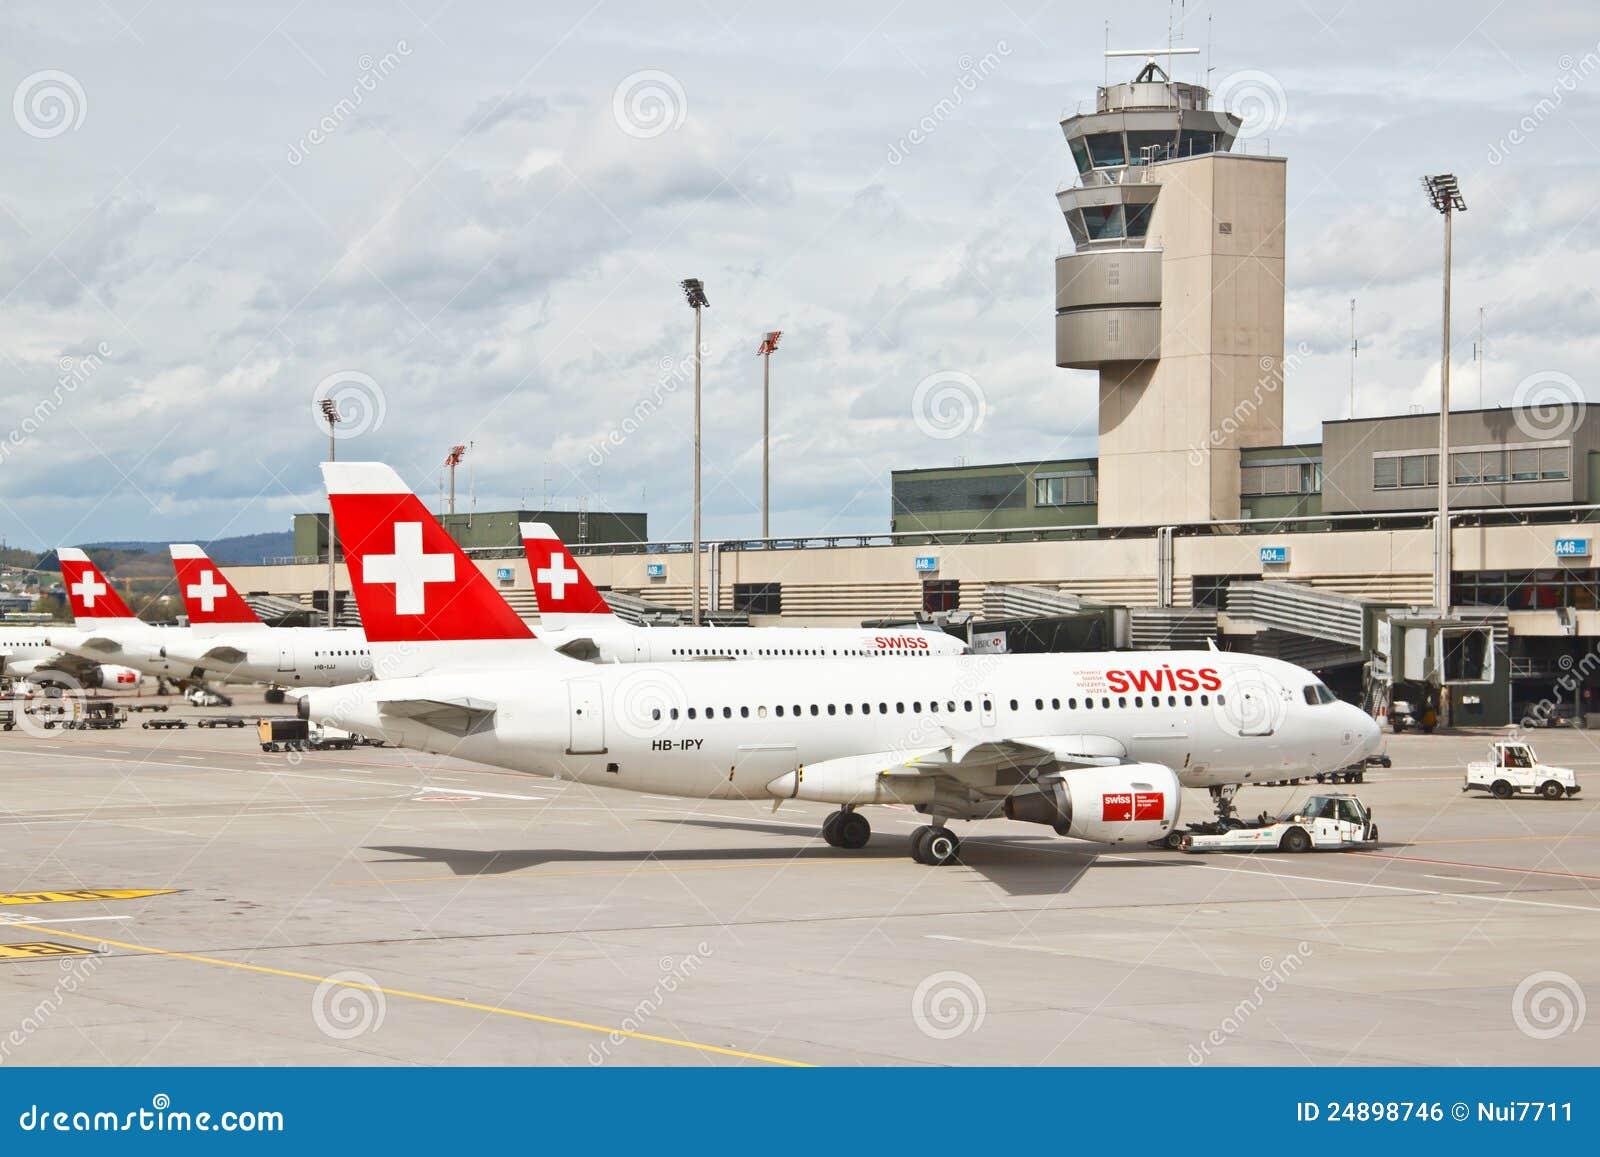 Swissair altes logo Svg together with Swissair purzuit also  on swissair altes logo svg